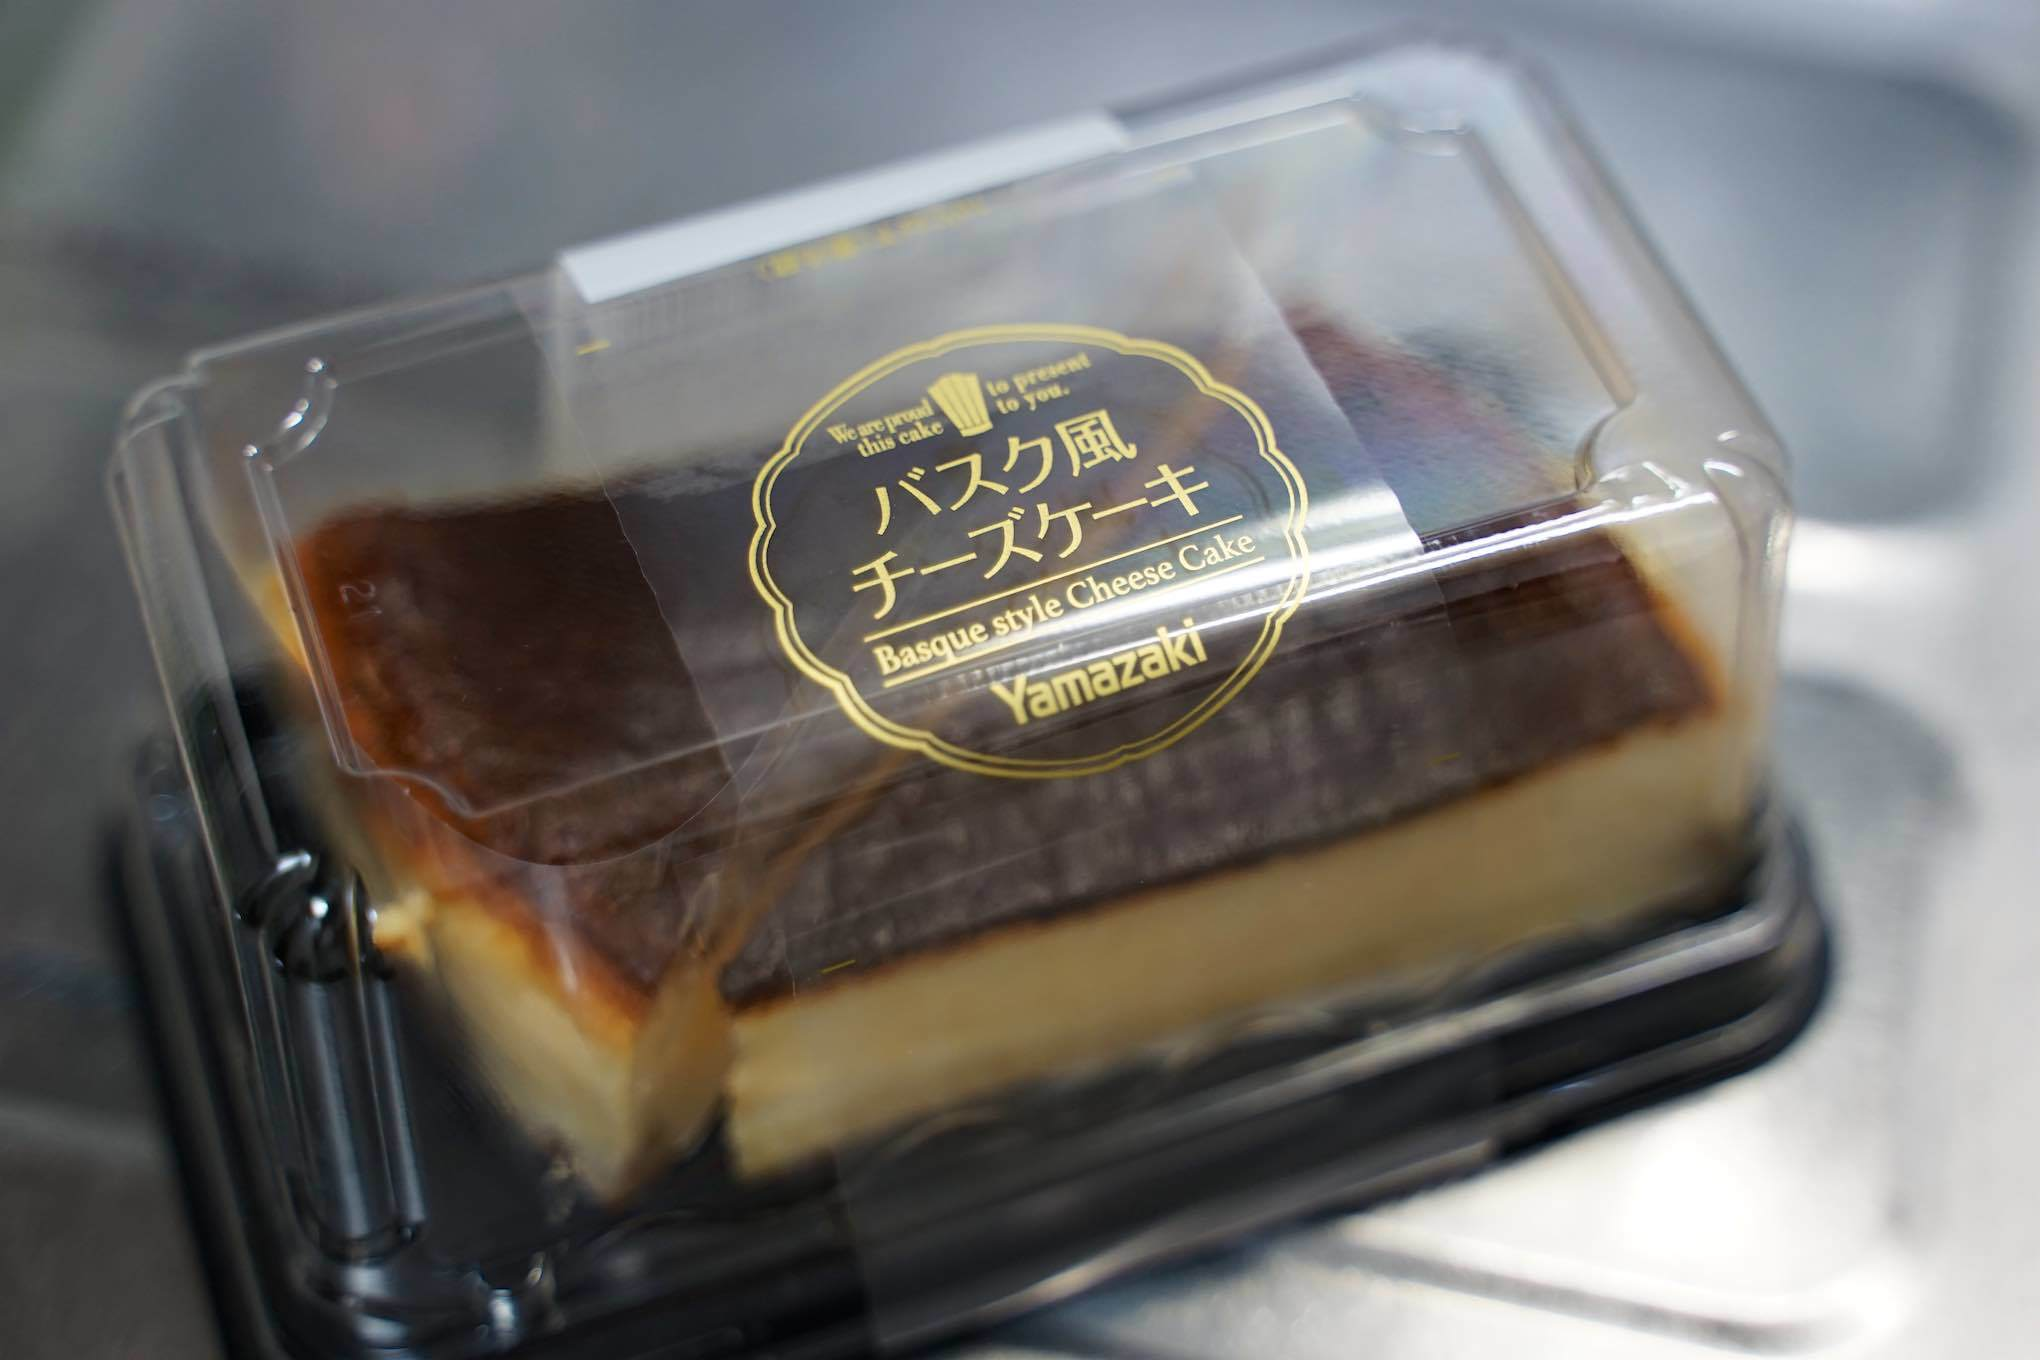 Yamazaki バスク風チーズケーキ_b0360240_12301235.jpg